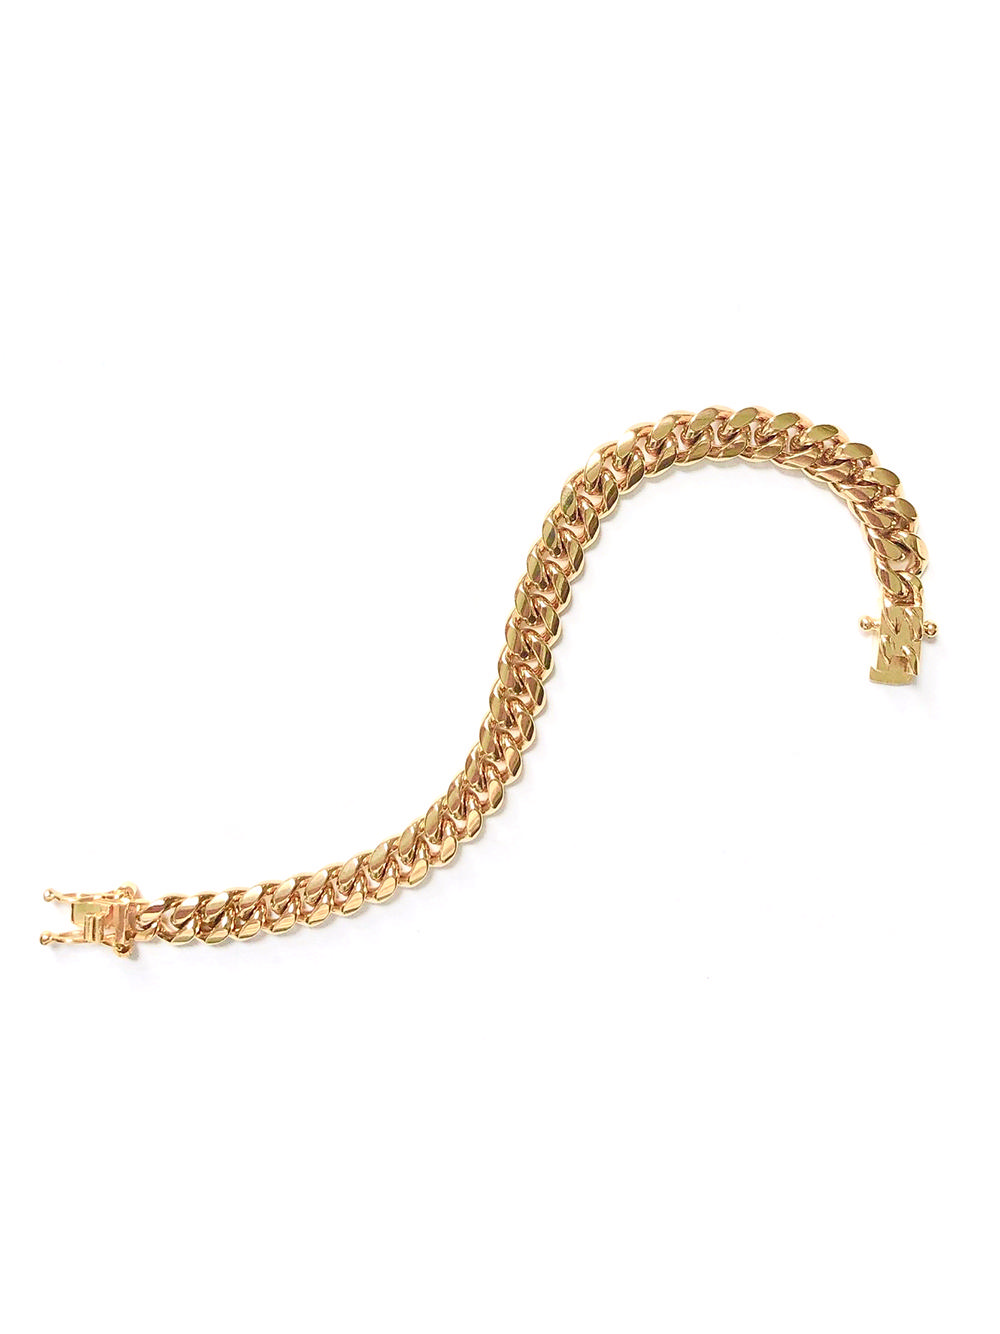 Ruth Curb Chain Bracelet 8mm